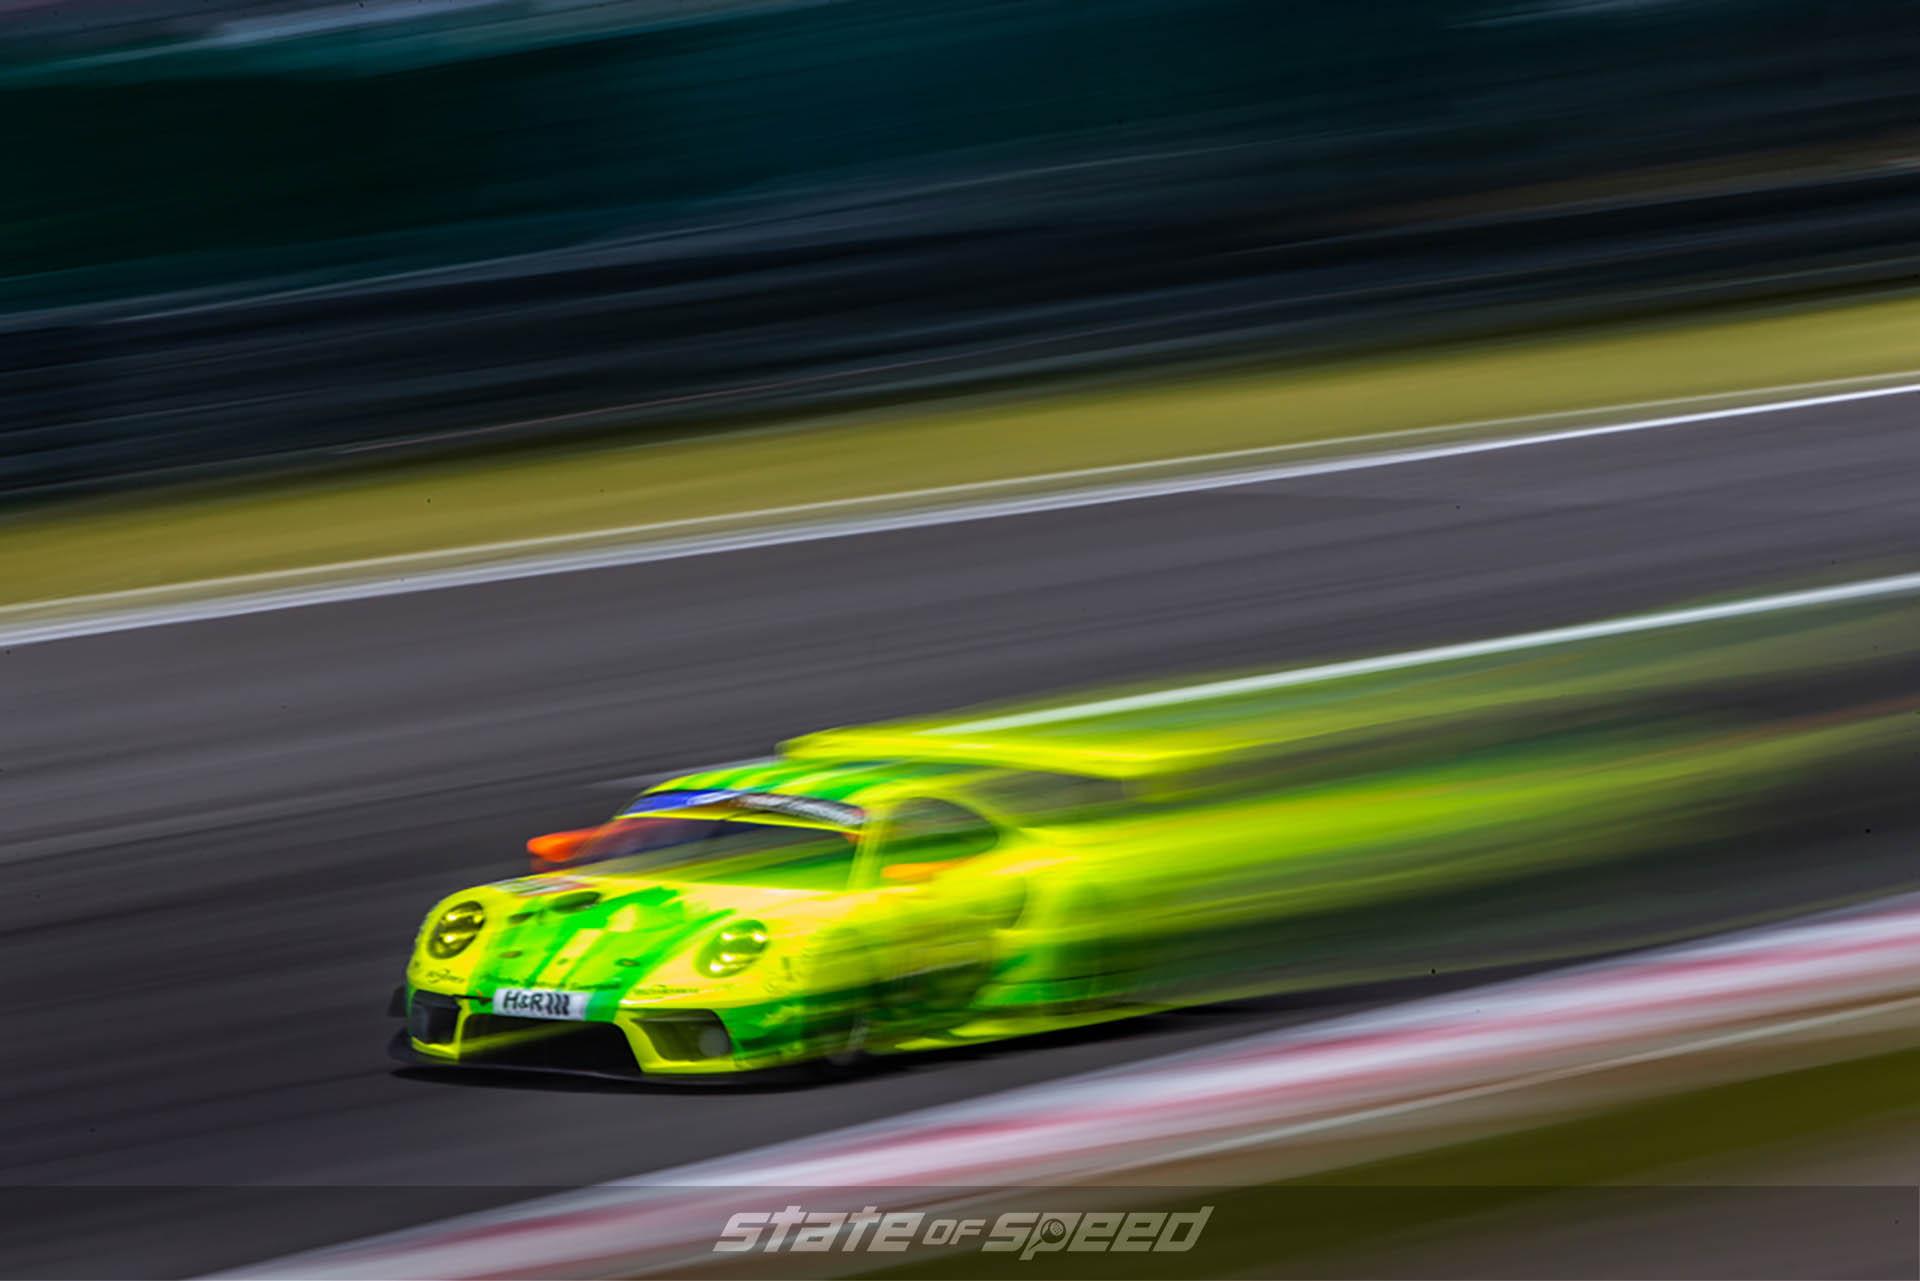 Porsche racing at Nurburgring